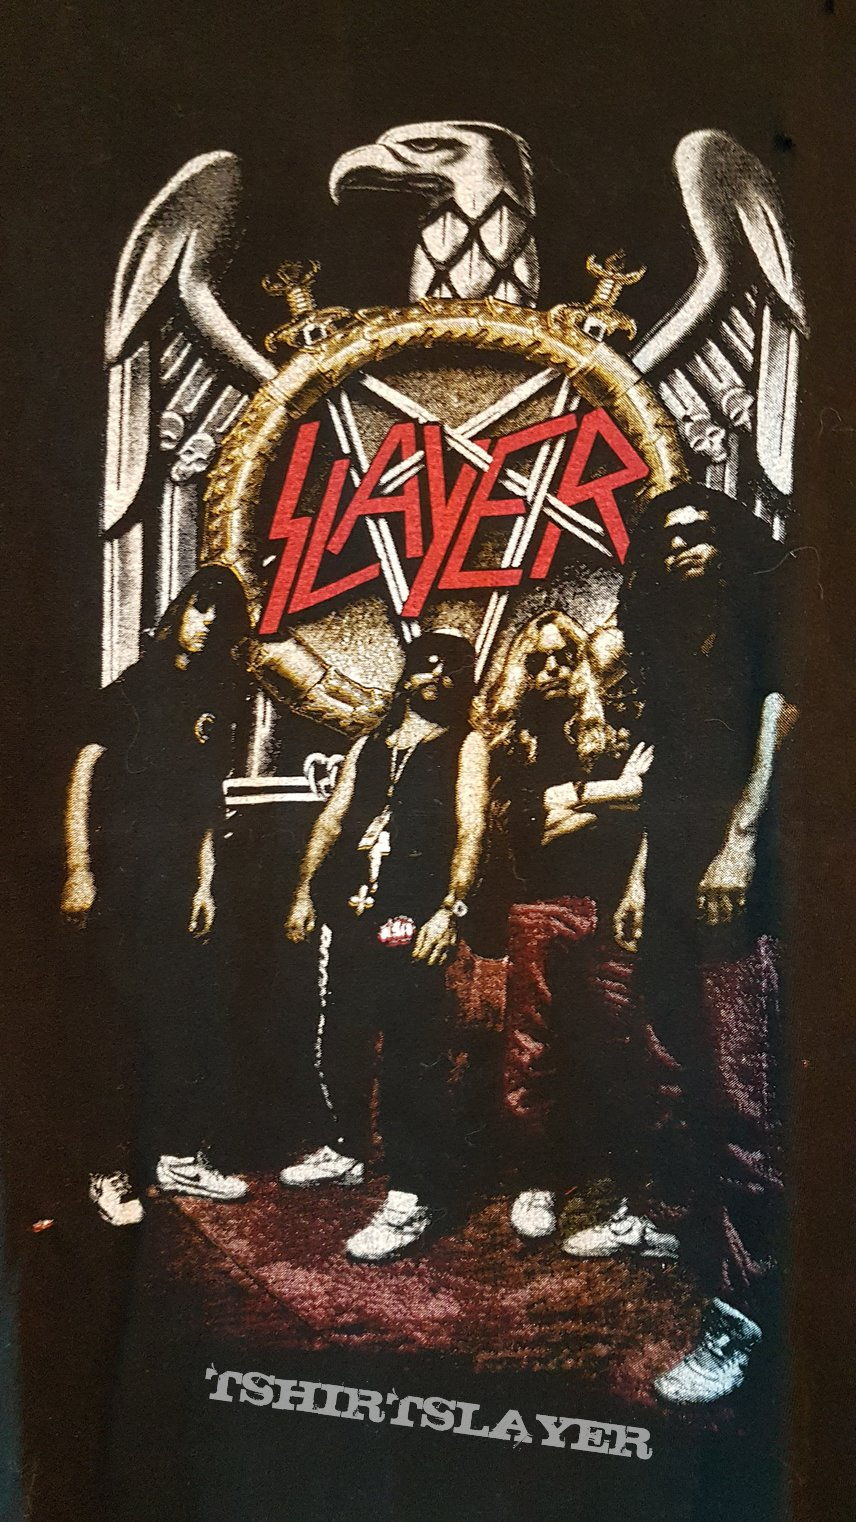 Slayer Dedicated of Aggression Promo TS